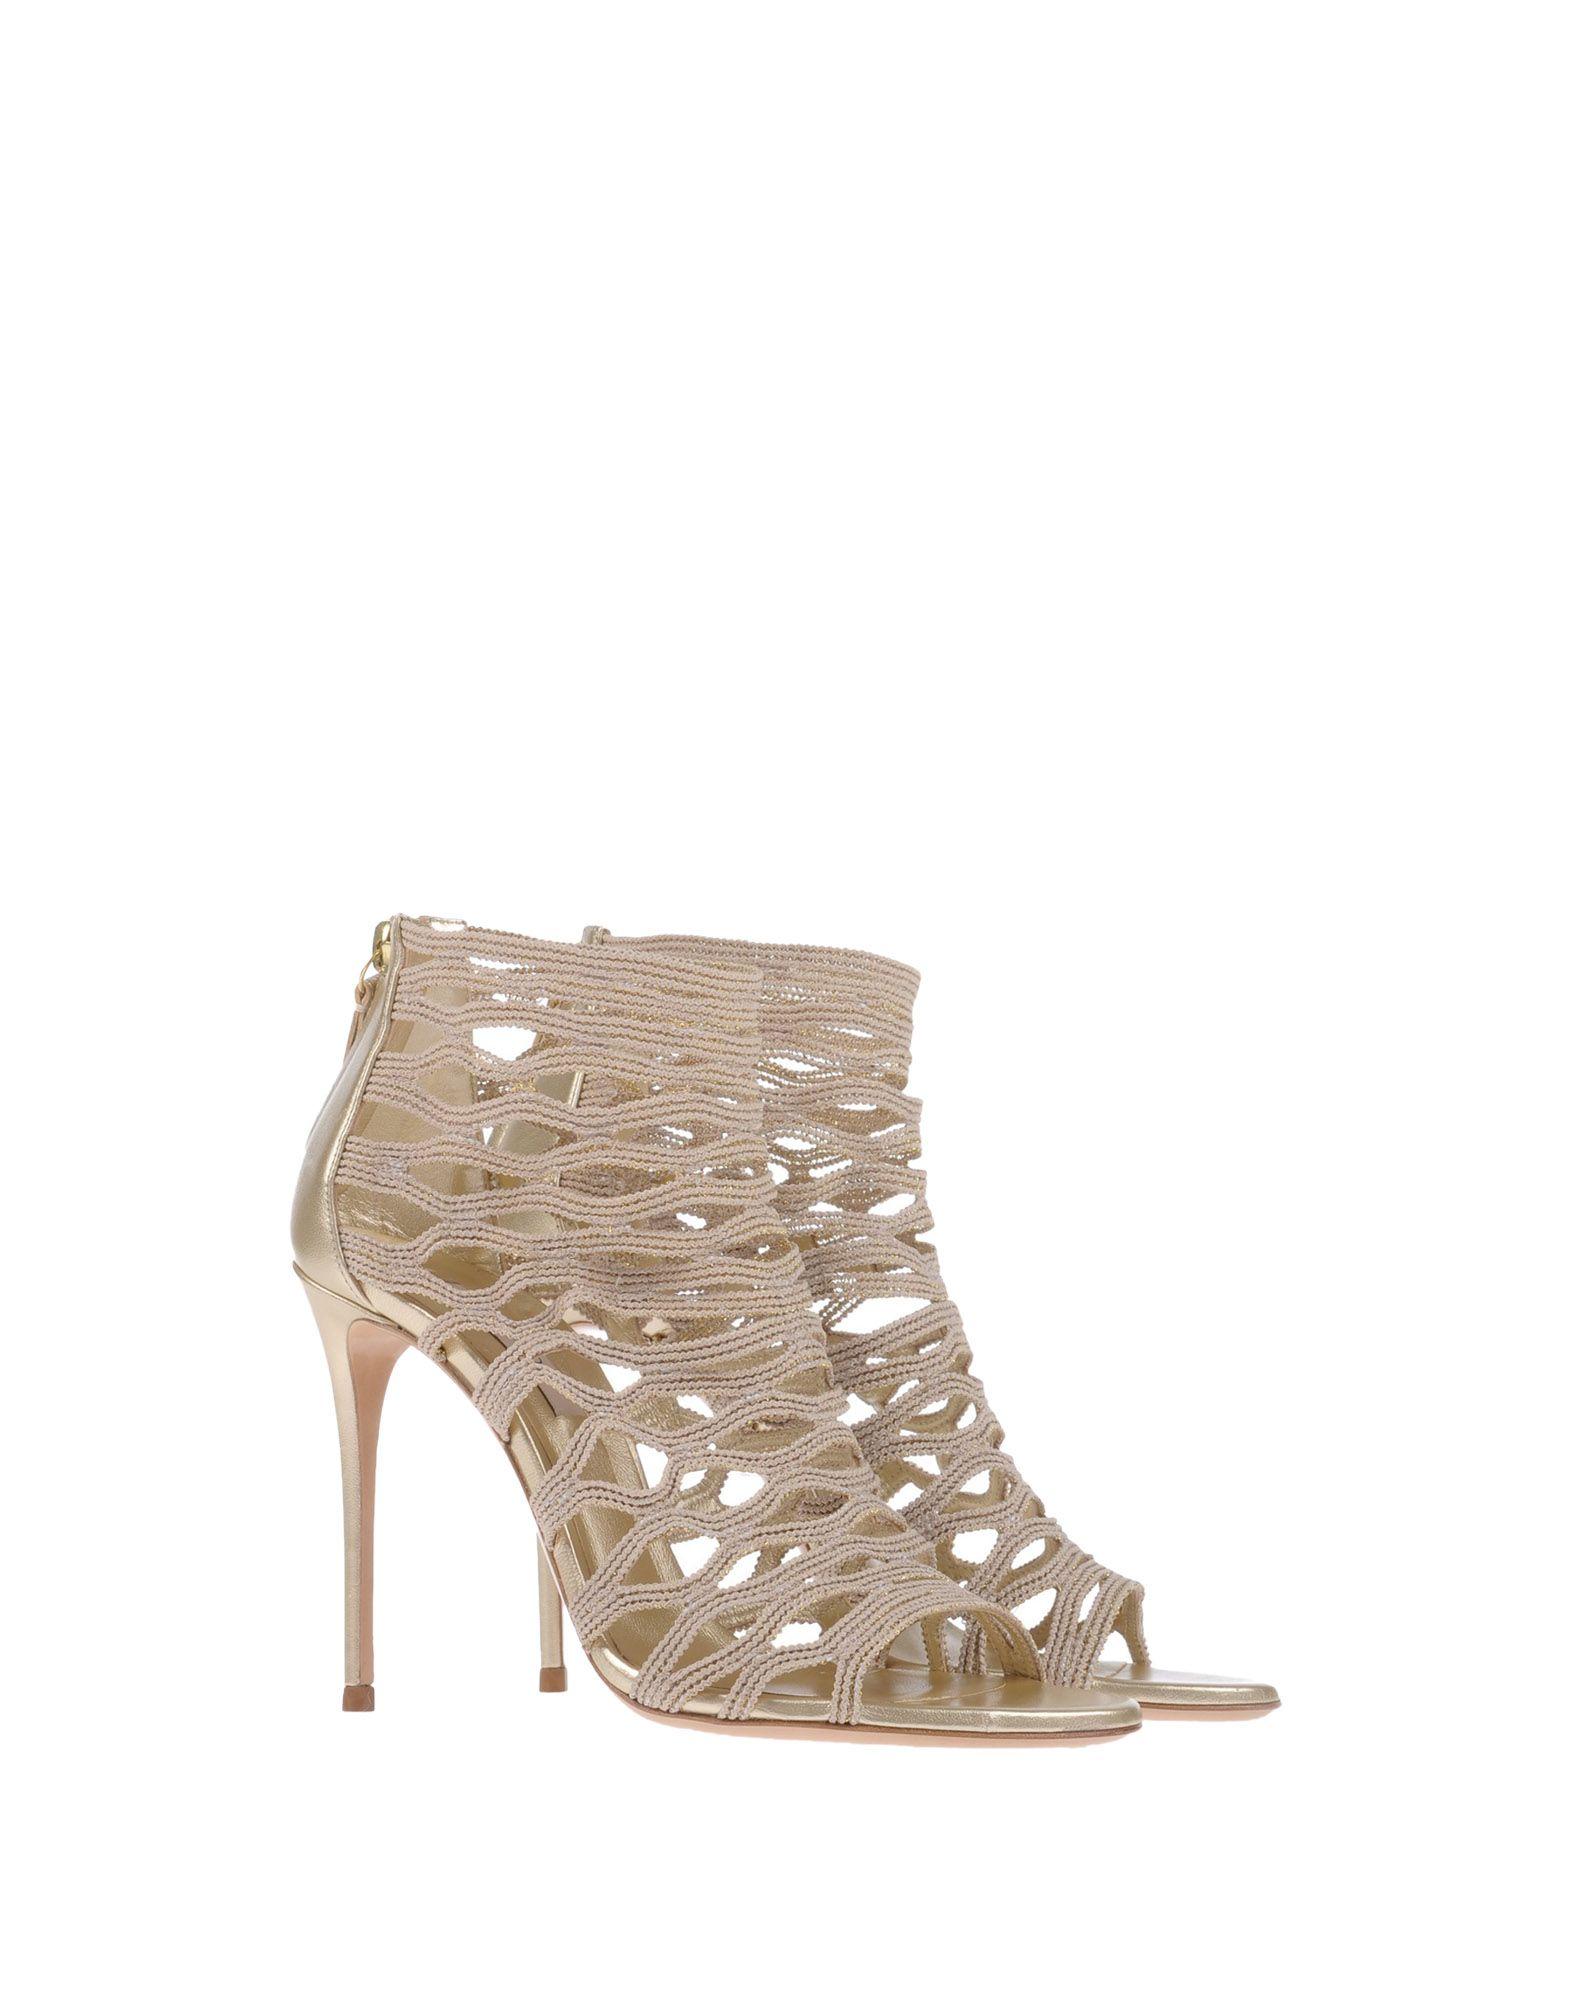 Rabatt Schuhe 11188471FO Casadei Sandalen Damen  11188471FO Schuhe a3ce90